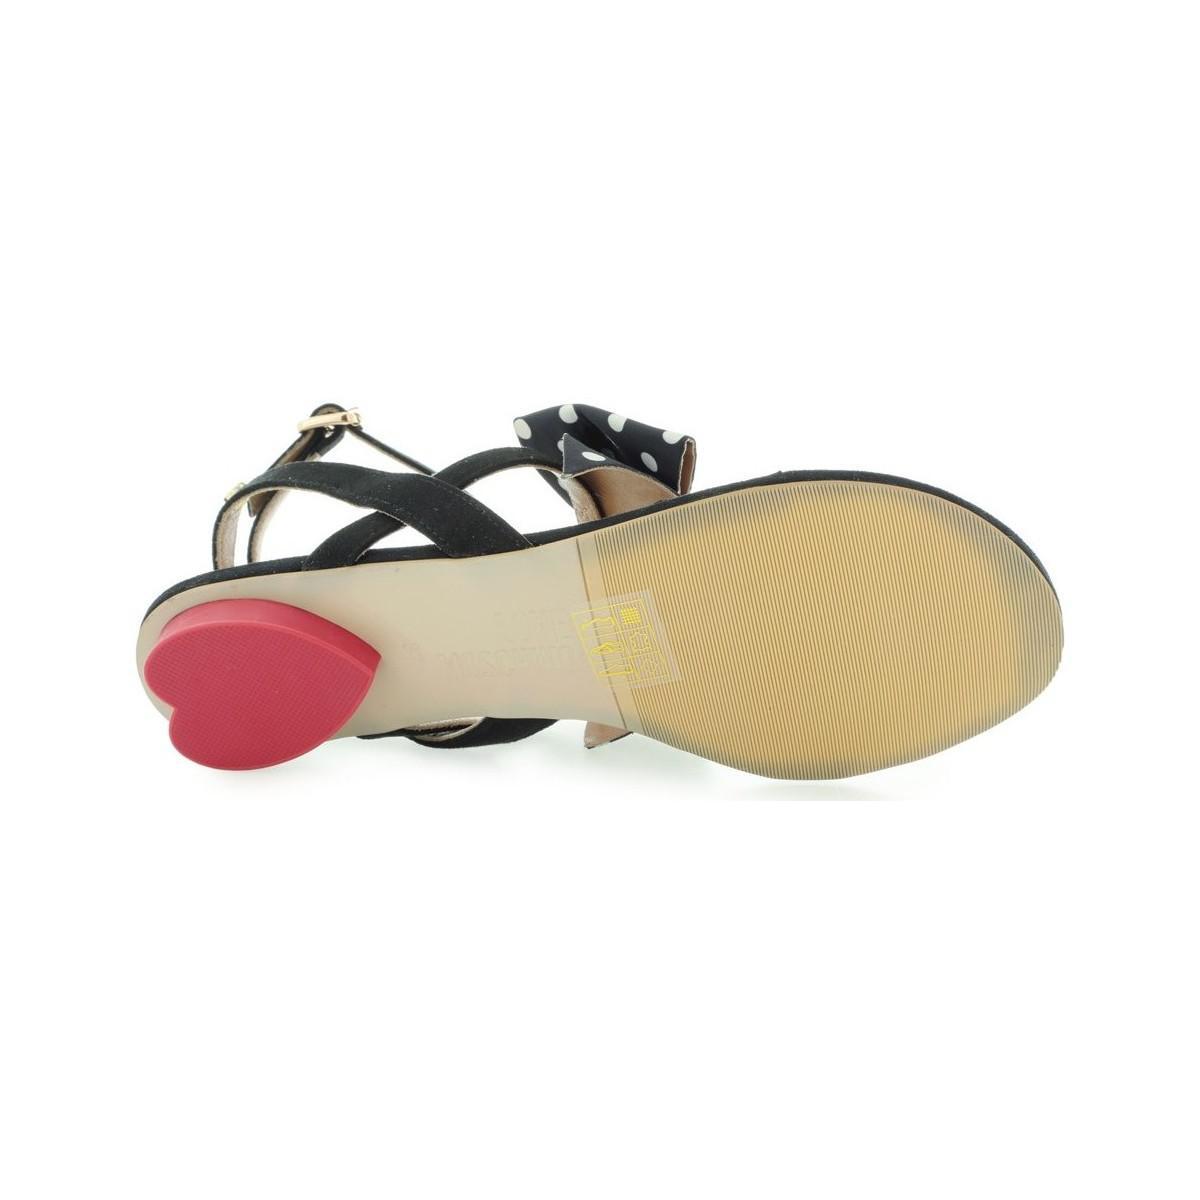 Love Moschino Sandales Sandalo LO DLAV0915 Campu Pois Nero Bianco Love Moschino kipeEj5